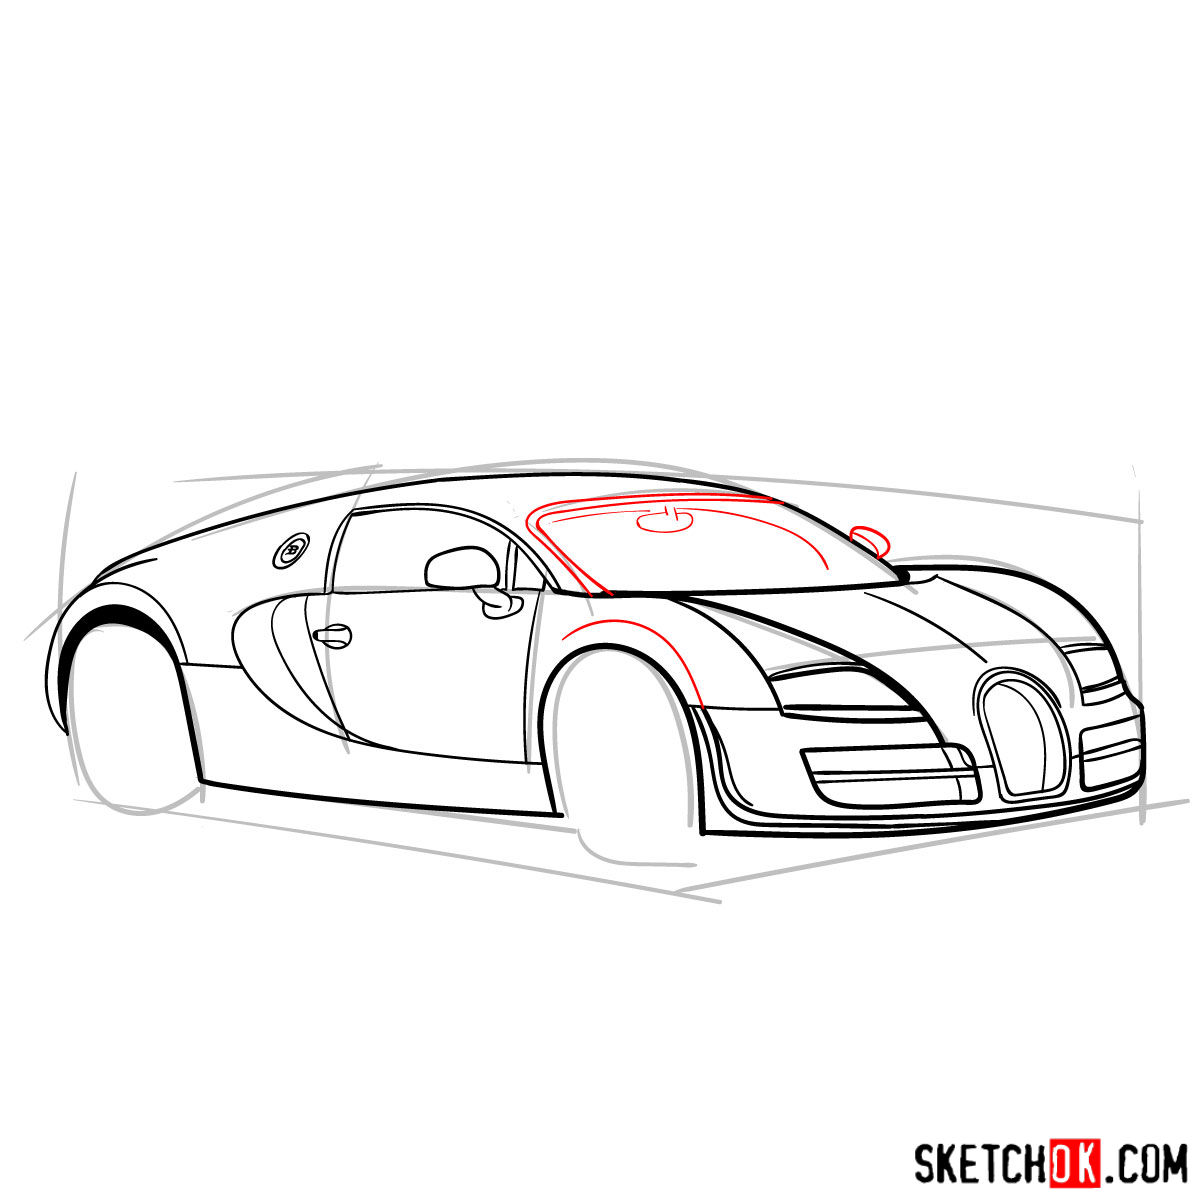 How to draw Bugatti Veyron 16.4 Super Sport - step 10